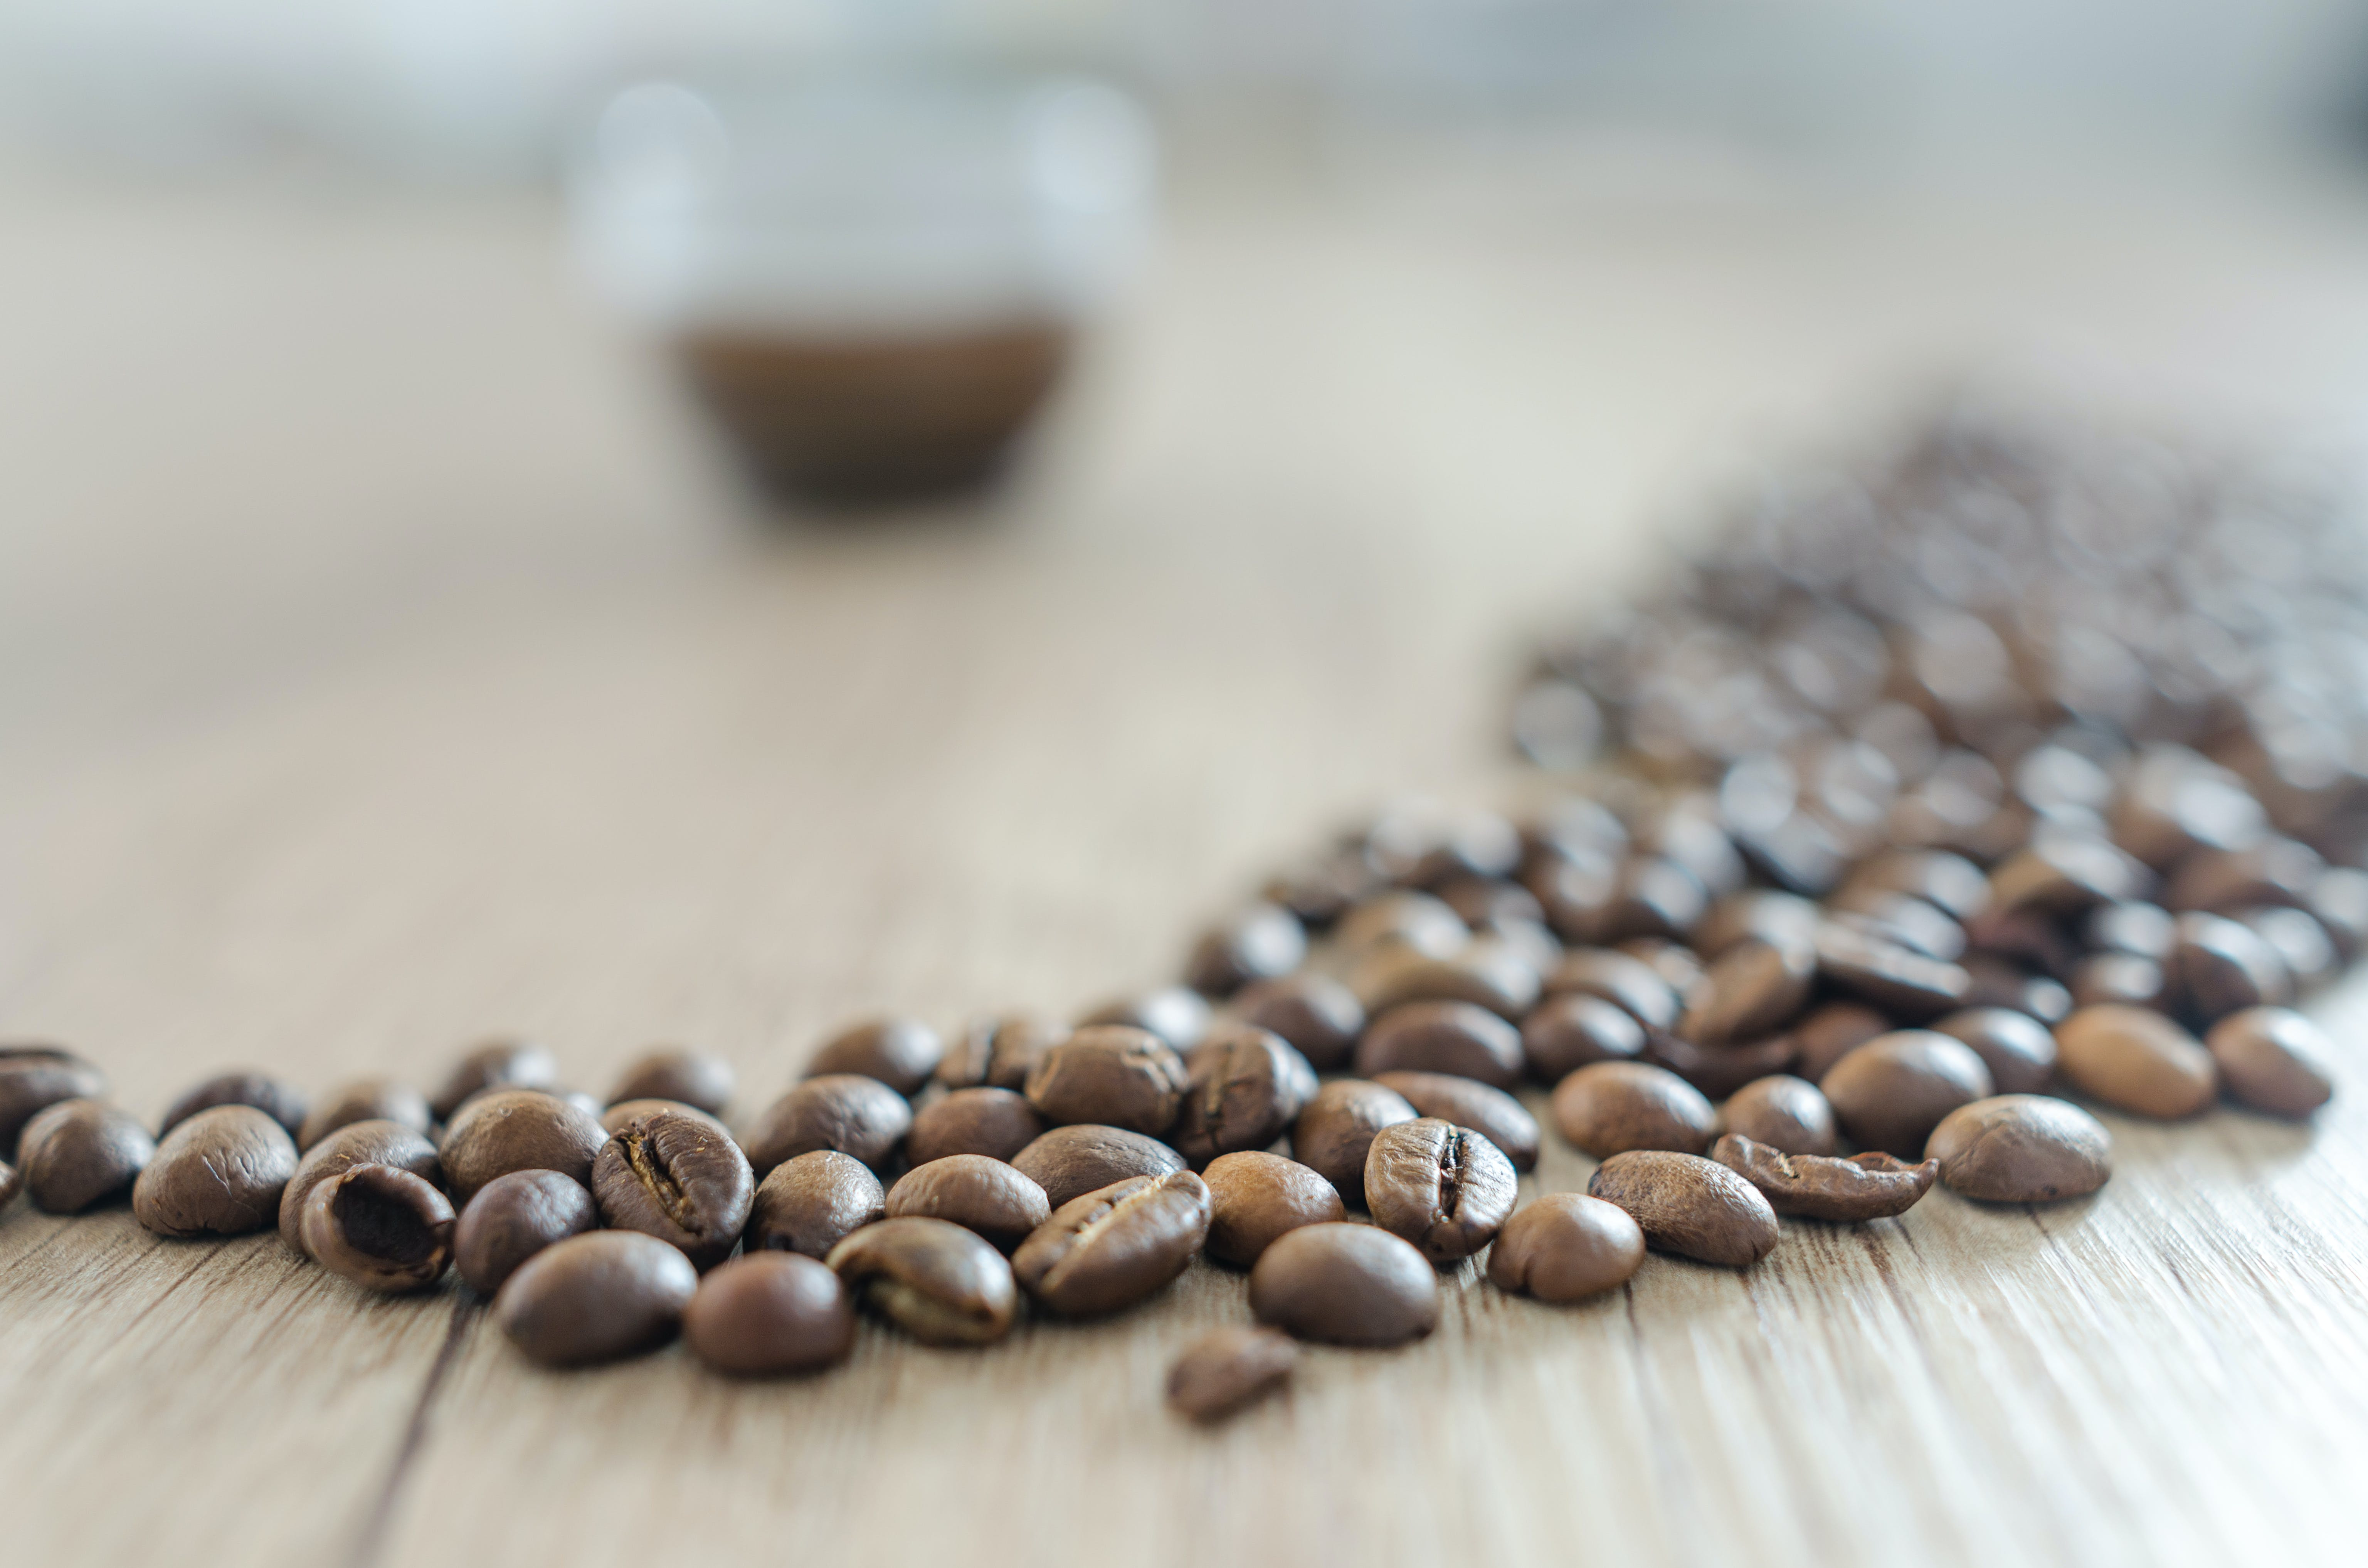 blur, caffeine, close-up